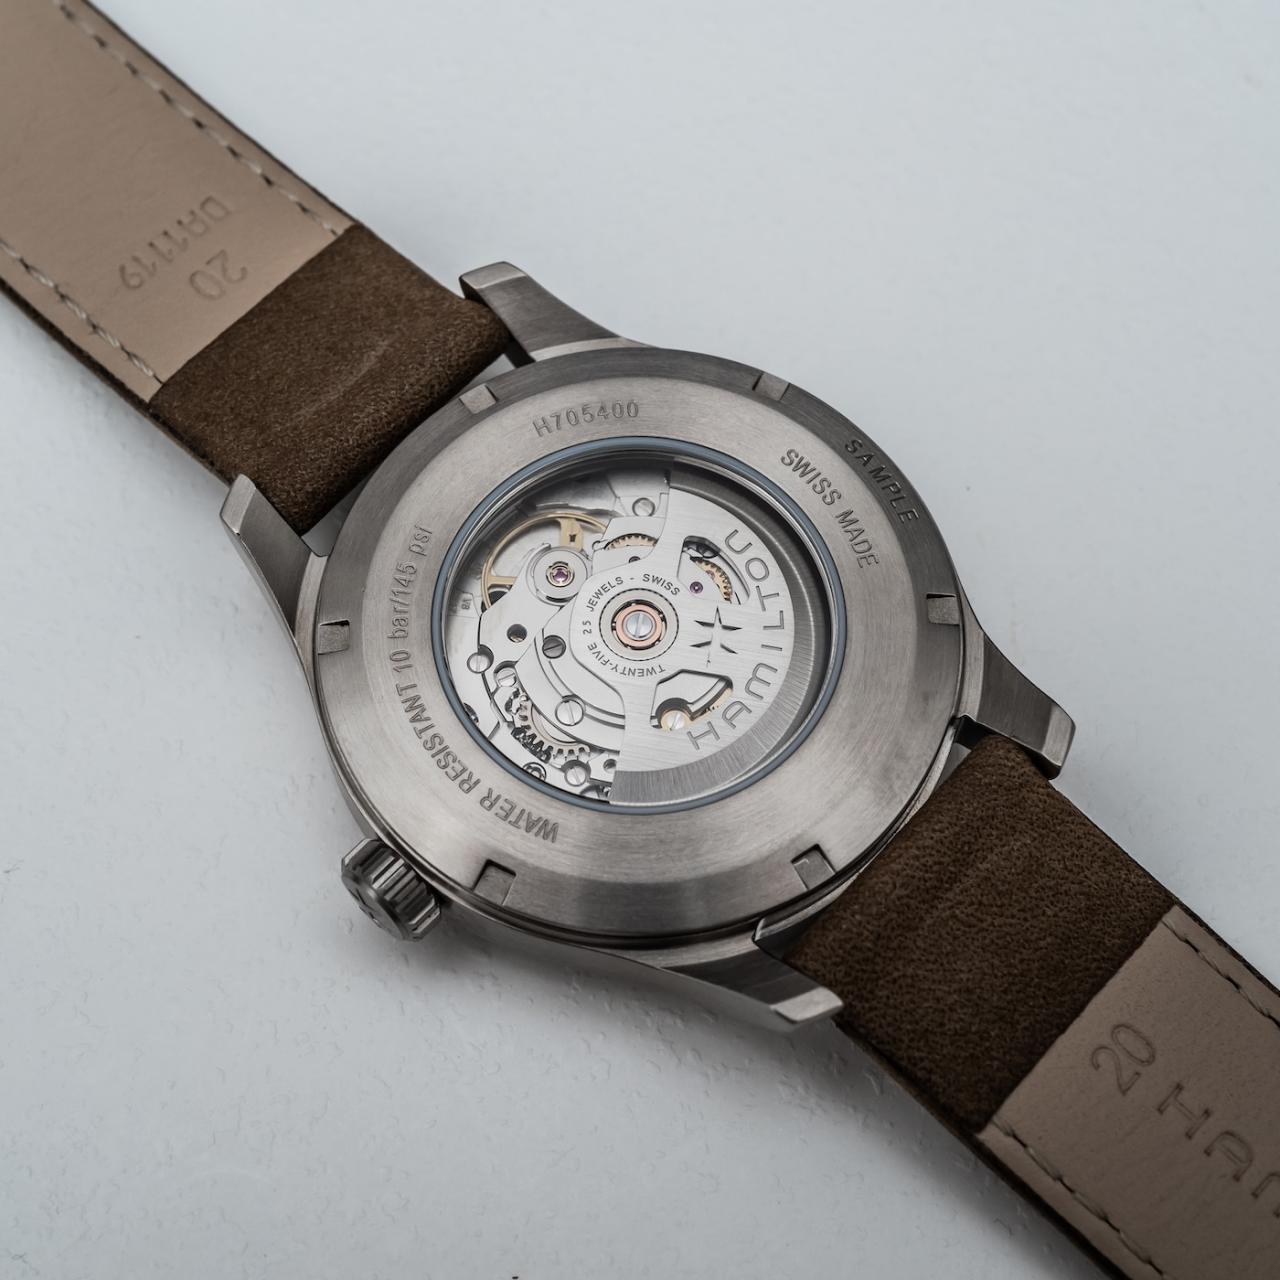 Hands-On: Hamilton Khaki Field Watch In Titanium Hands-On